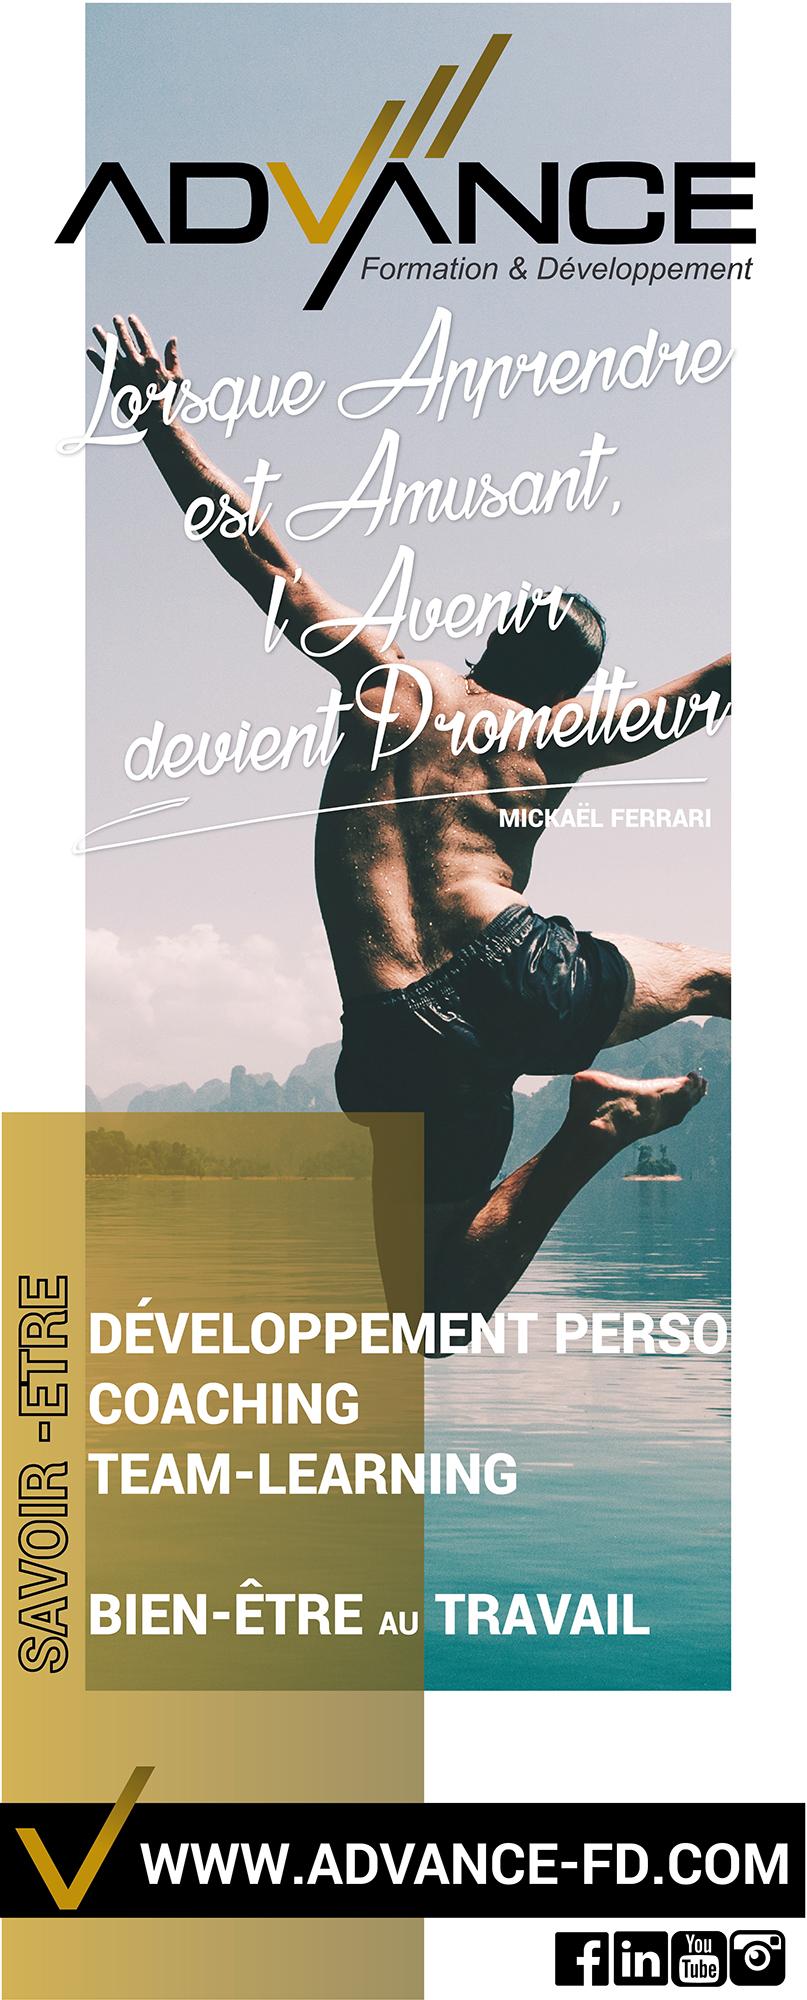 Advance Formation & Développement | Roll Up | Conception